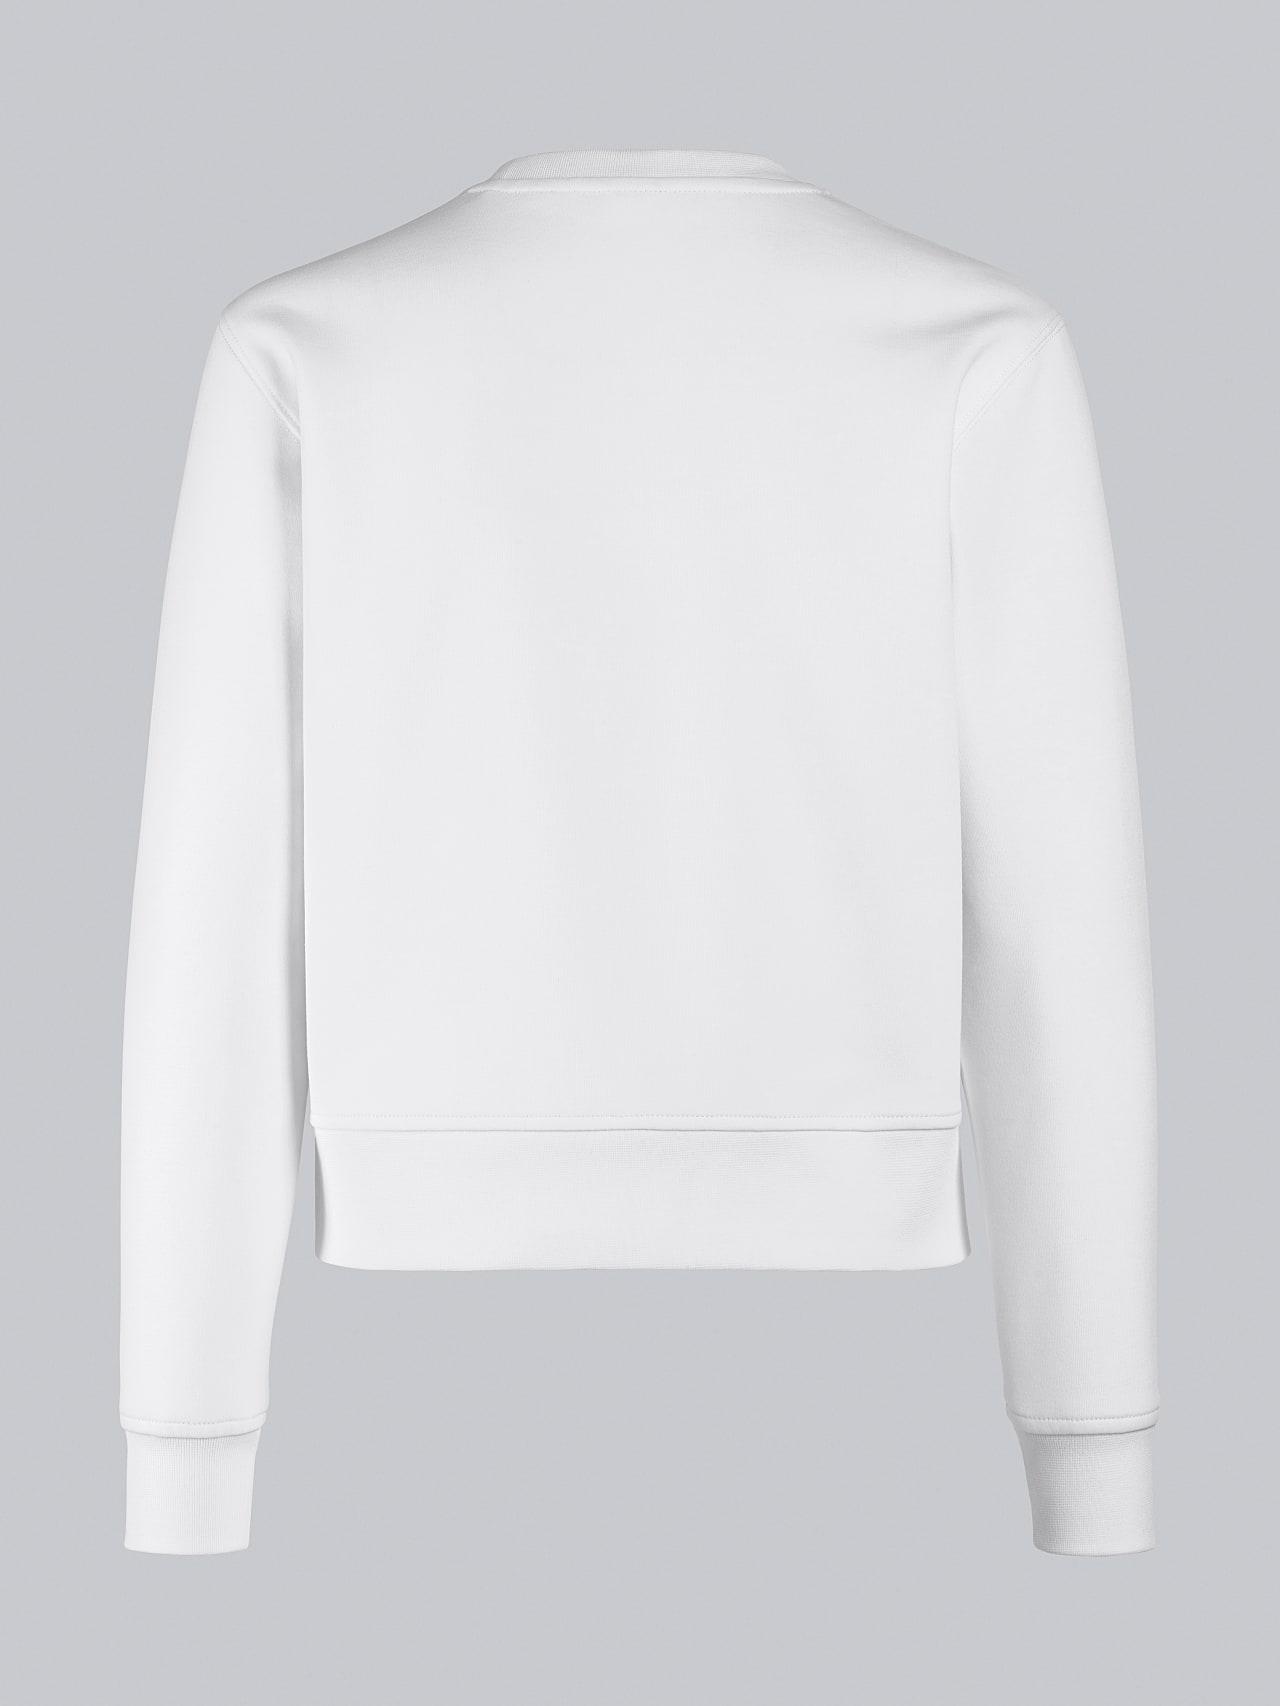 SHINT V1.Y5.02 Premium Logo Sweater offwhite Left Alpha Tauri